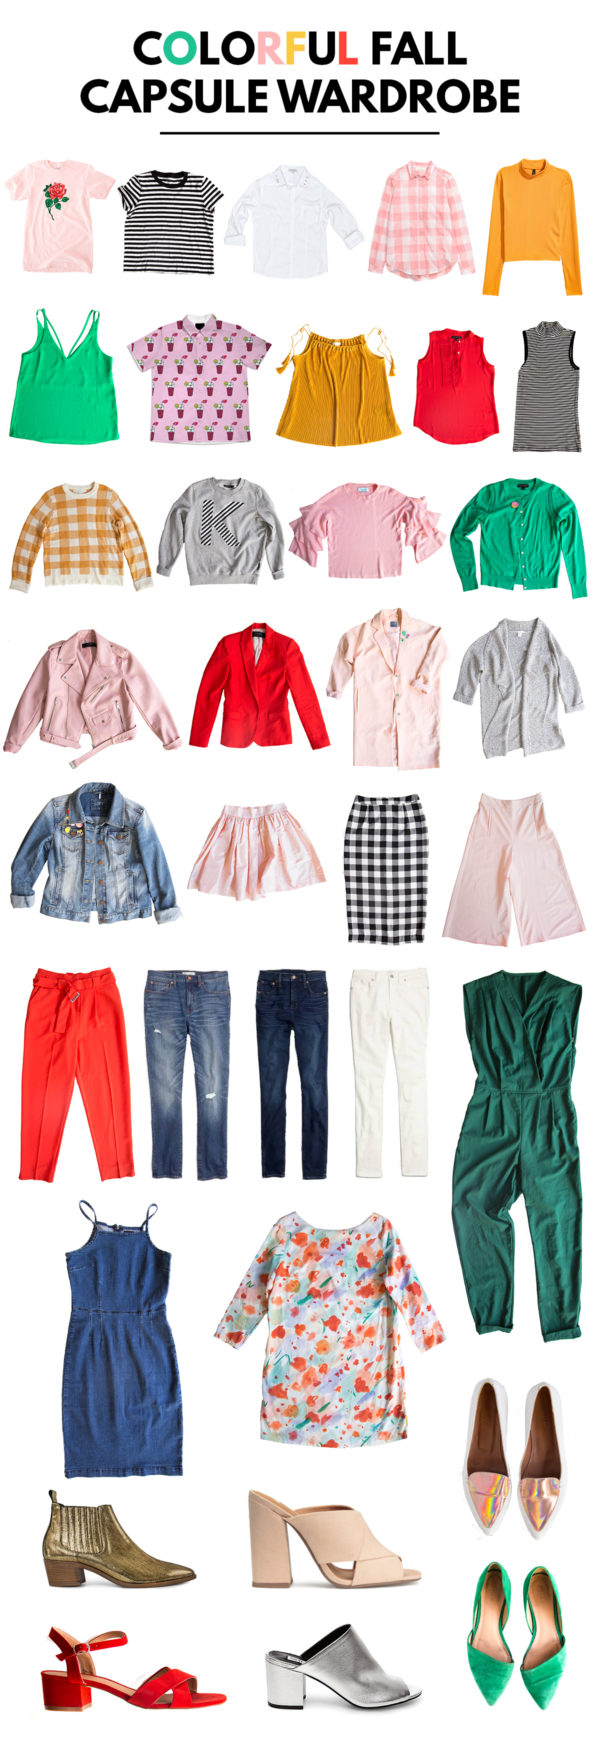 Colorful Fall Capsule Wardrobe